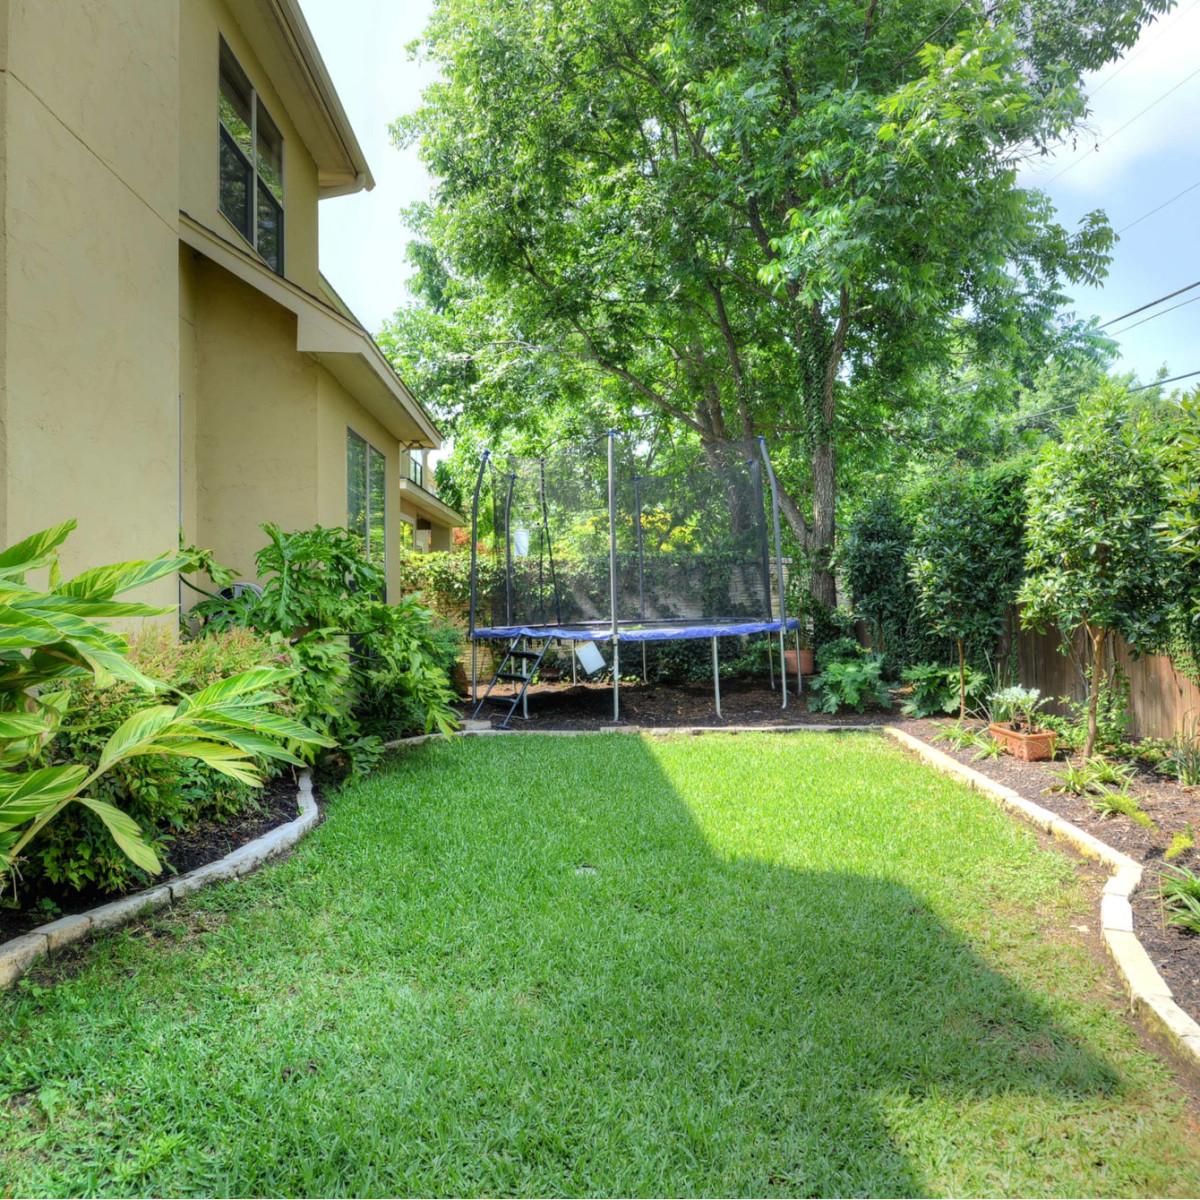 7111 Bethencourt San Antonio house for sale backyard